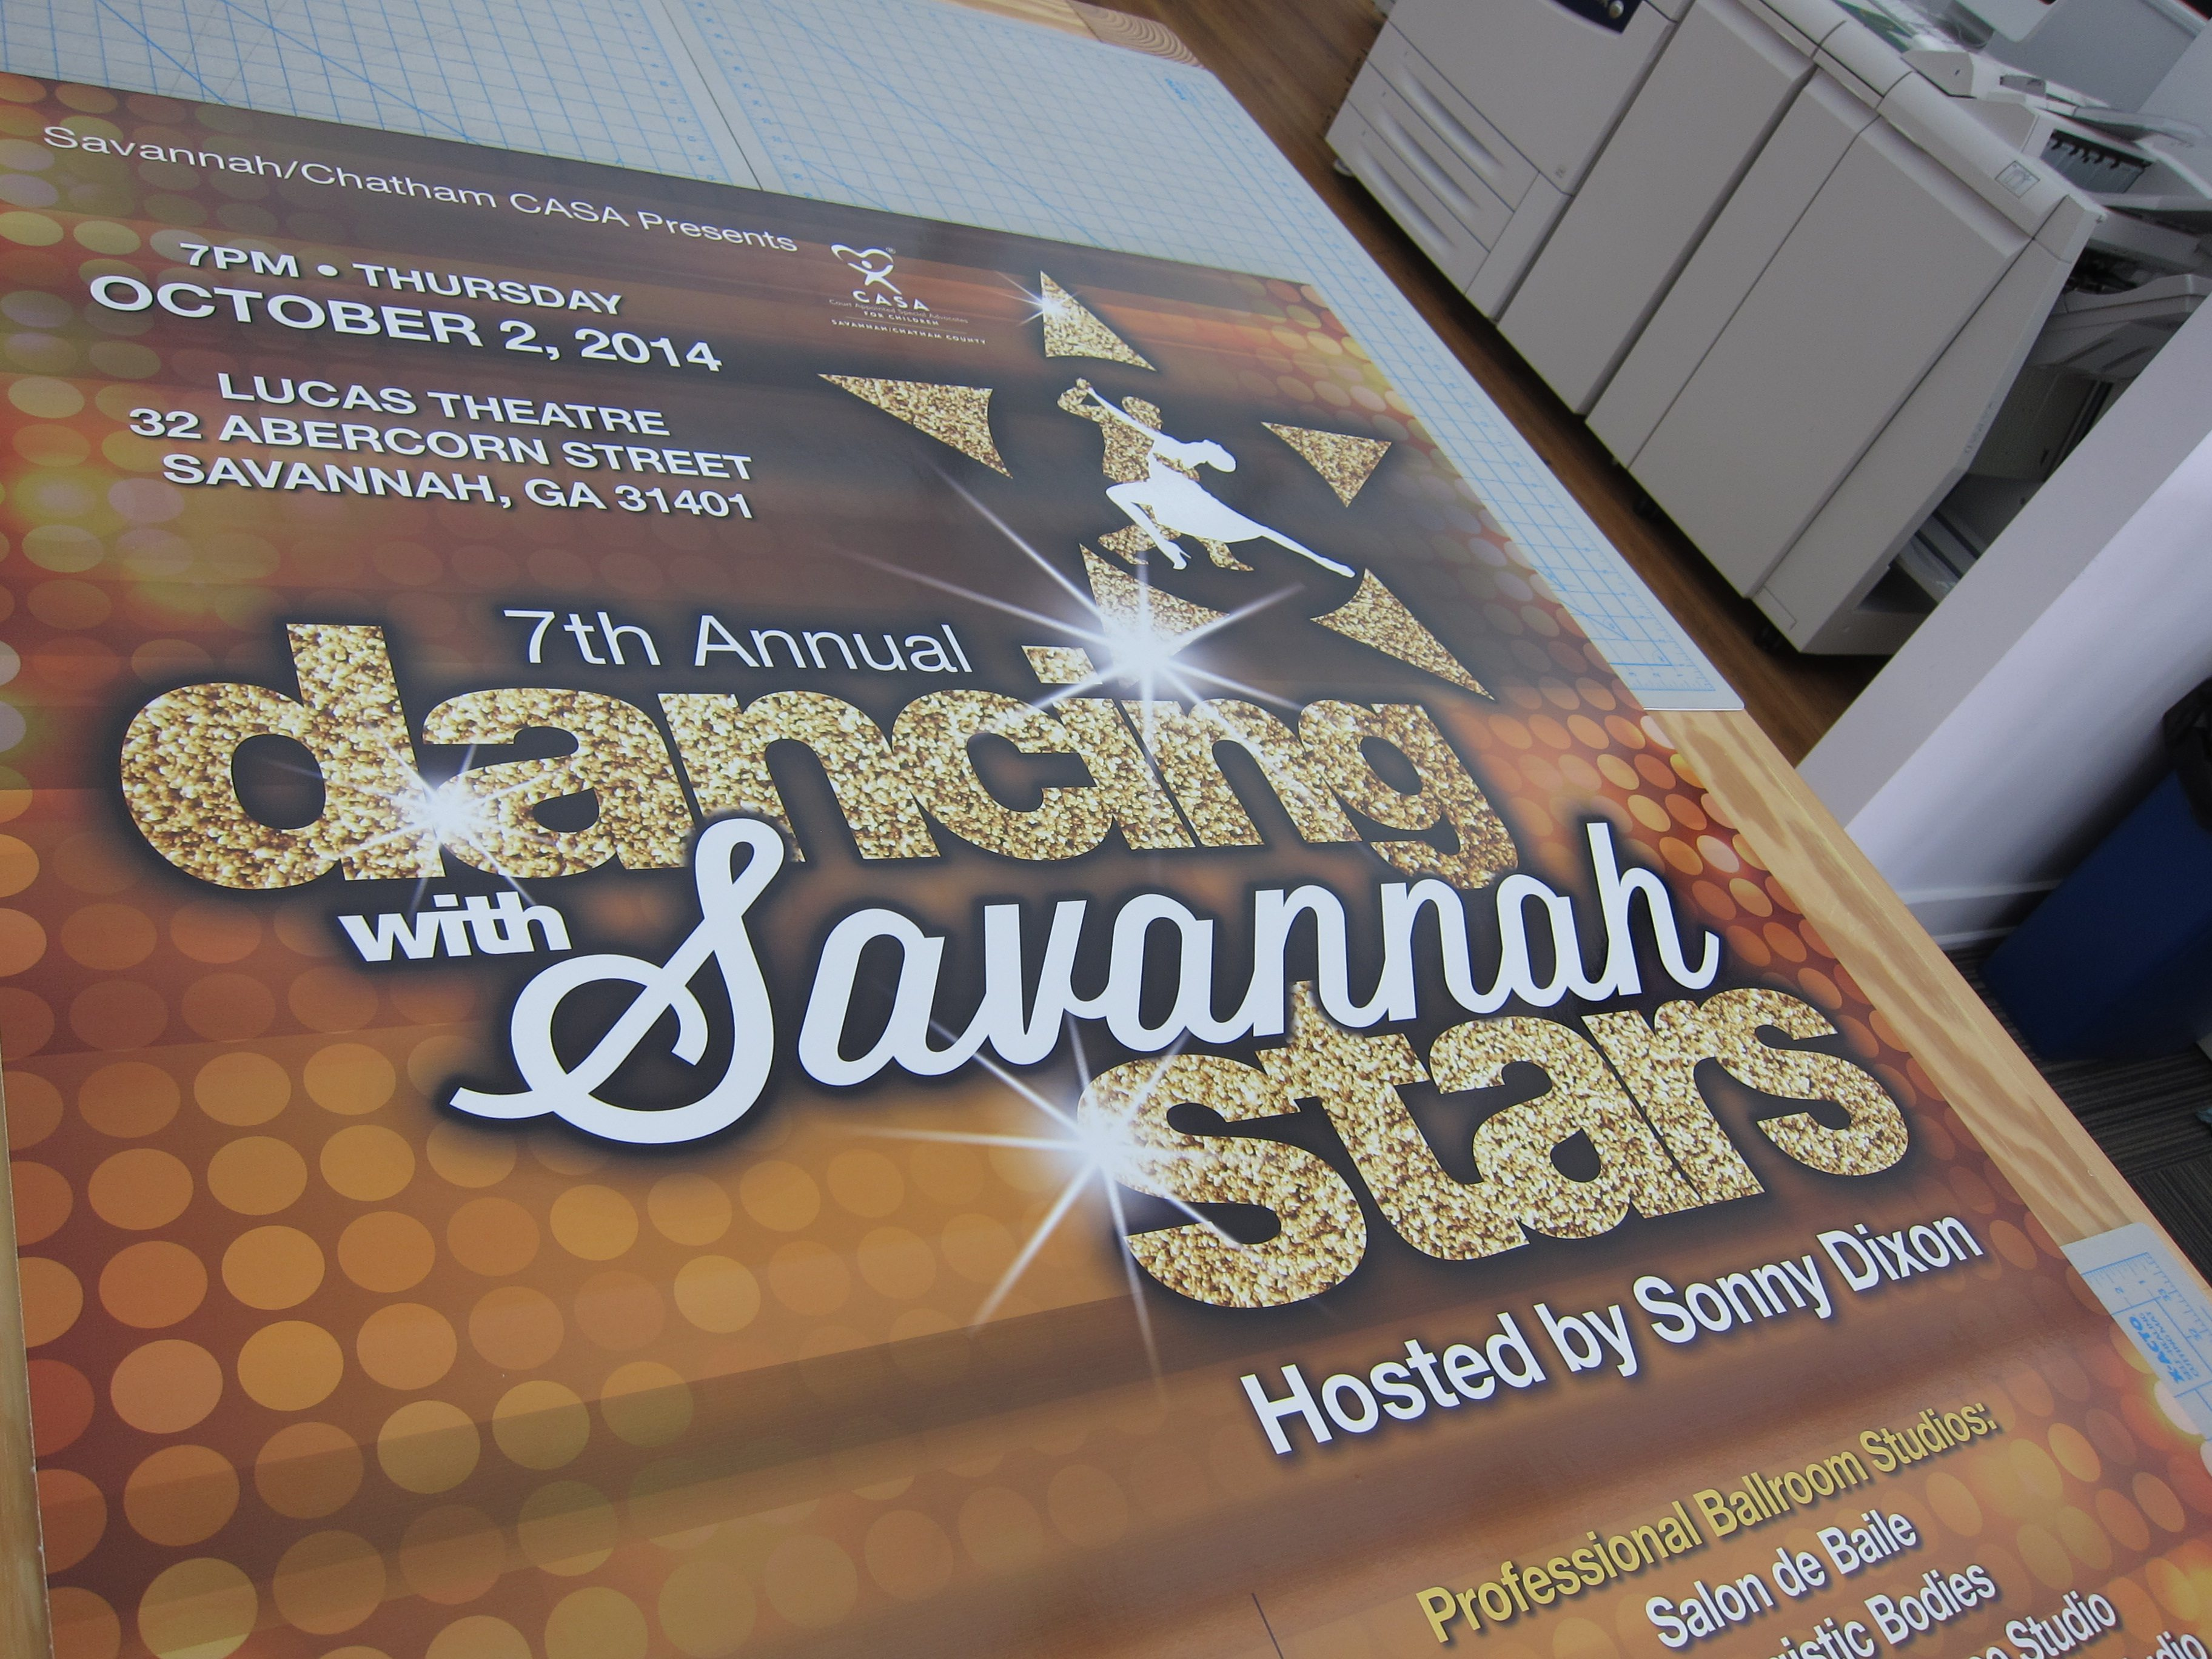 Posters | Dancing with Savannah Stars